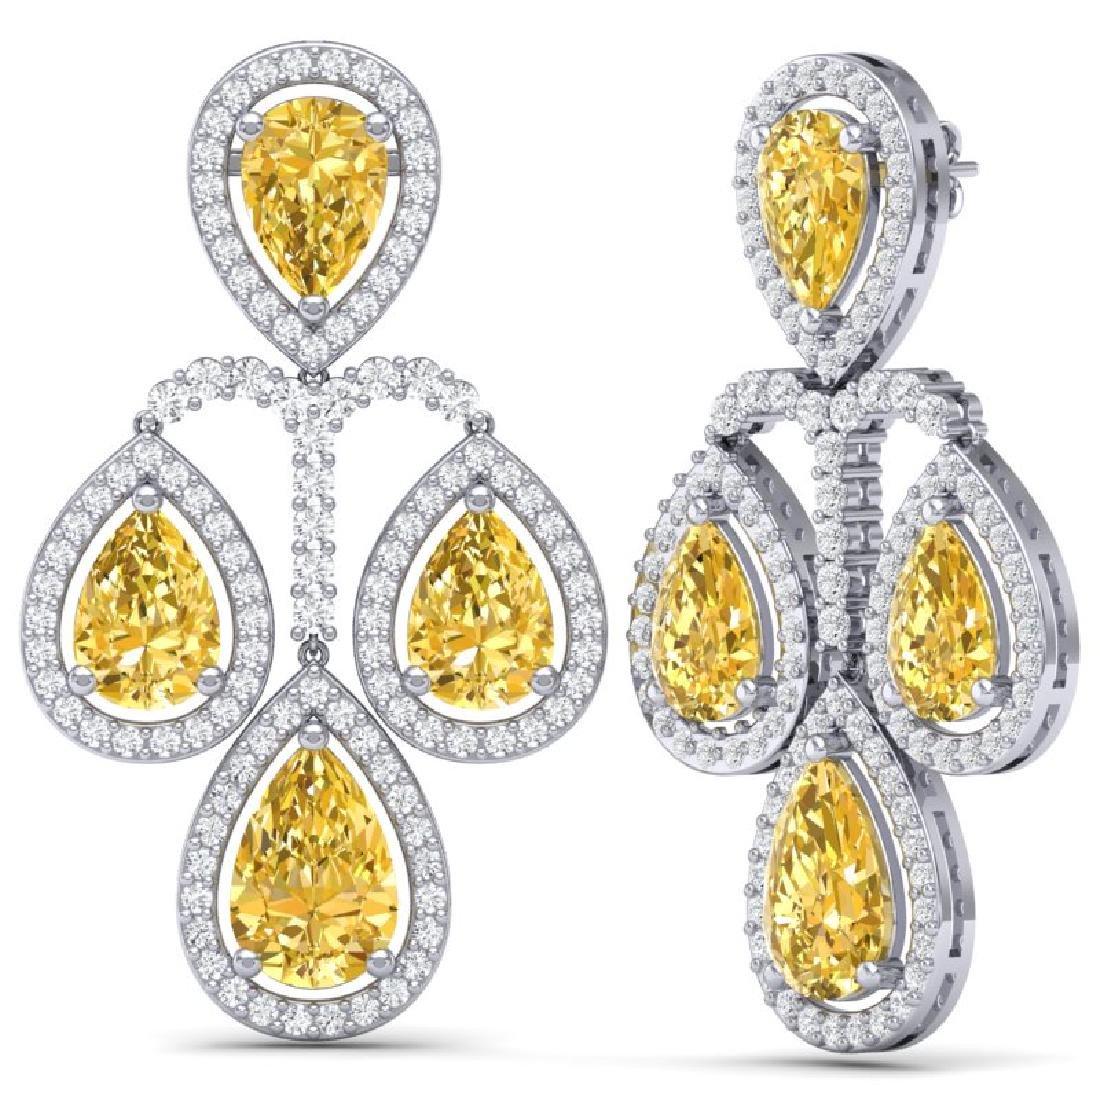 27.85 CTW Royalty Canary Citrine & VS Diamond Earrings - 3